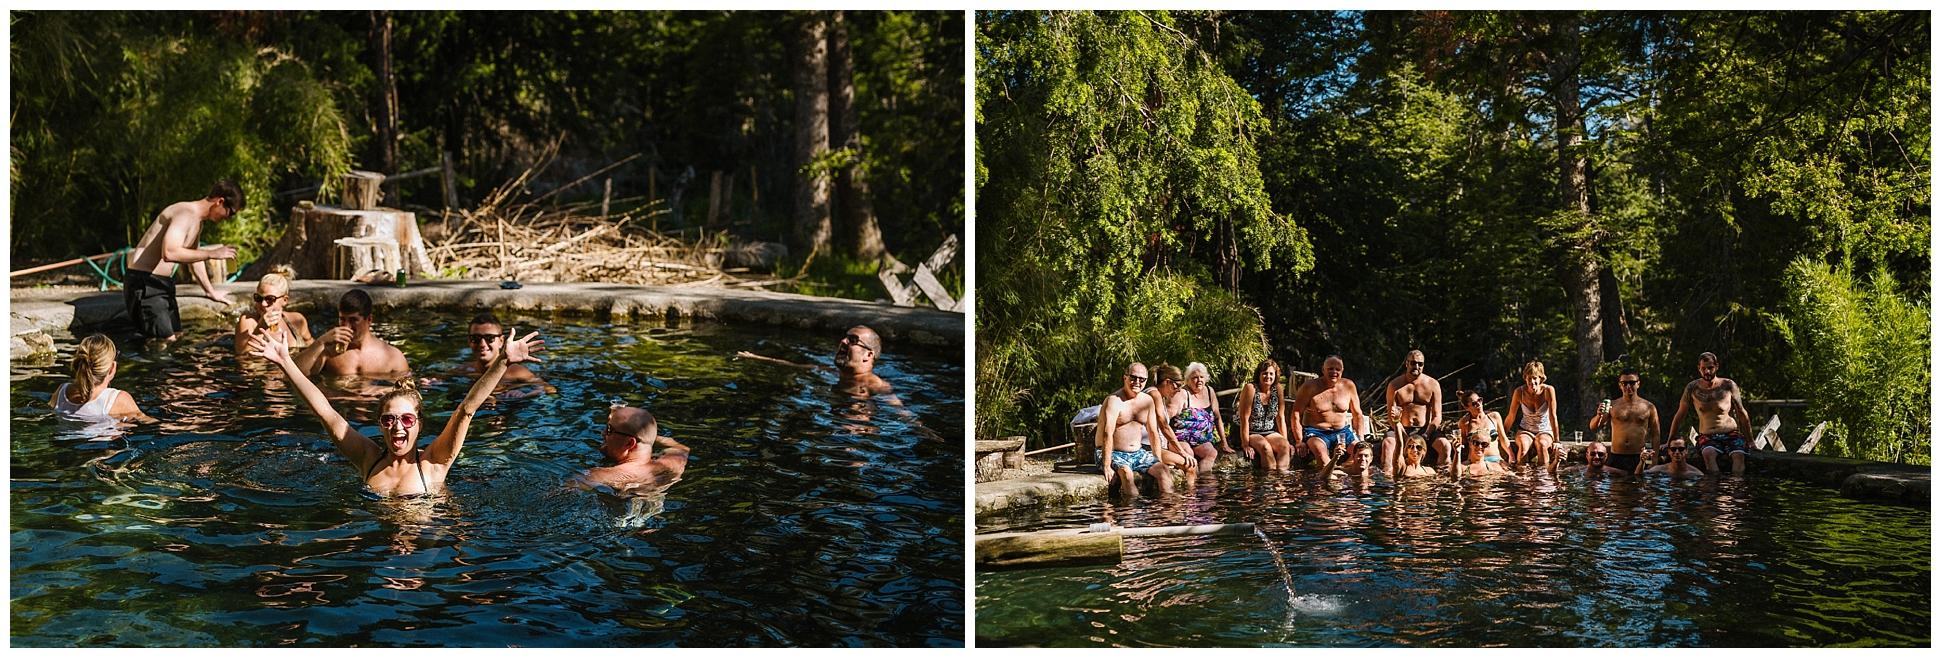 Cheilean-destination-adventure-wedding-florida-patagonia-pucon-santa-cruz-vsco_0029.jpg